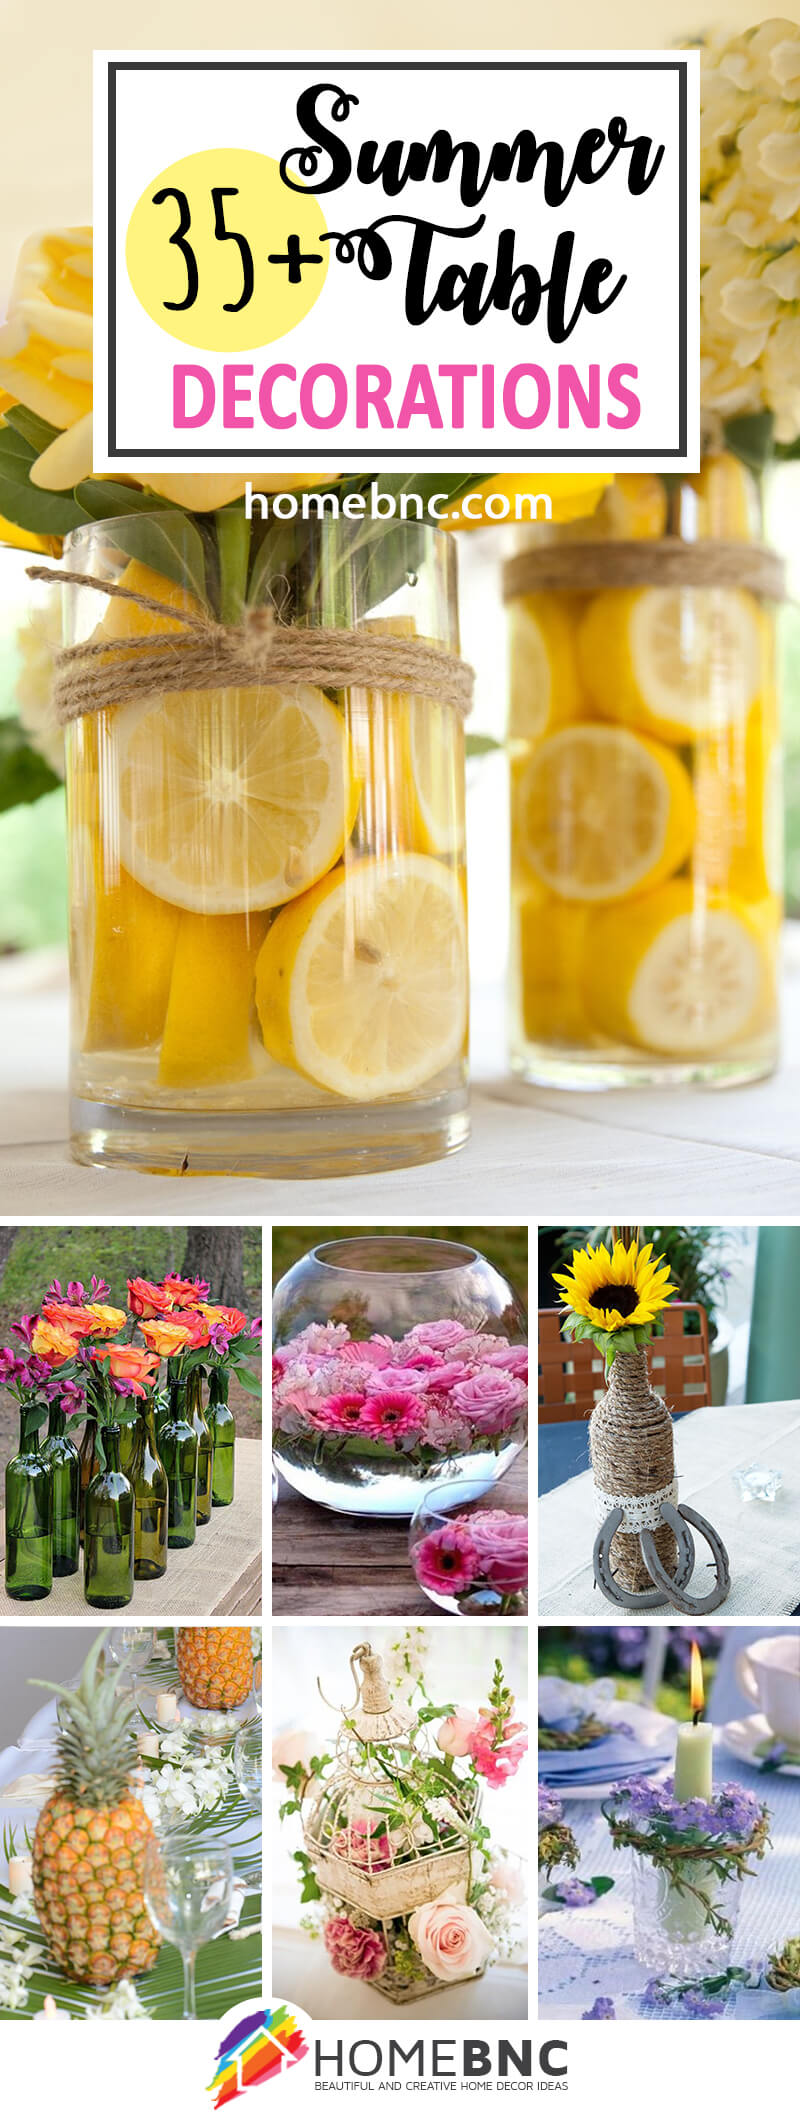 Summer Table Decoration Ideas